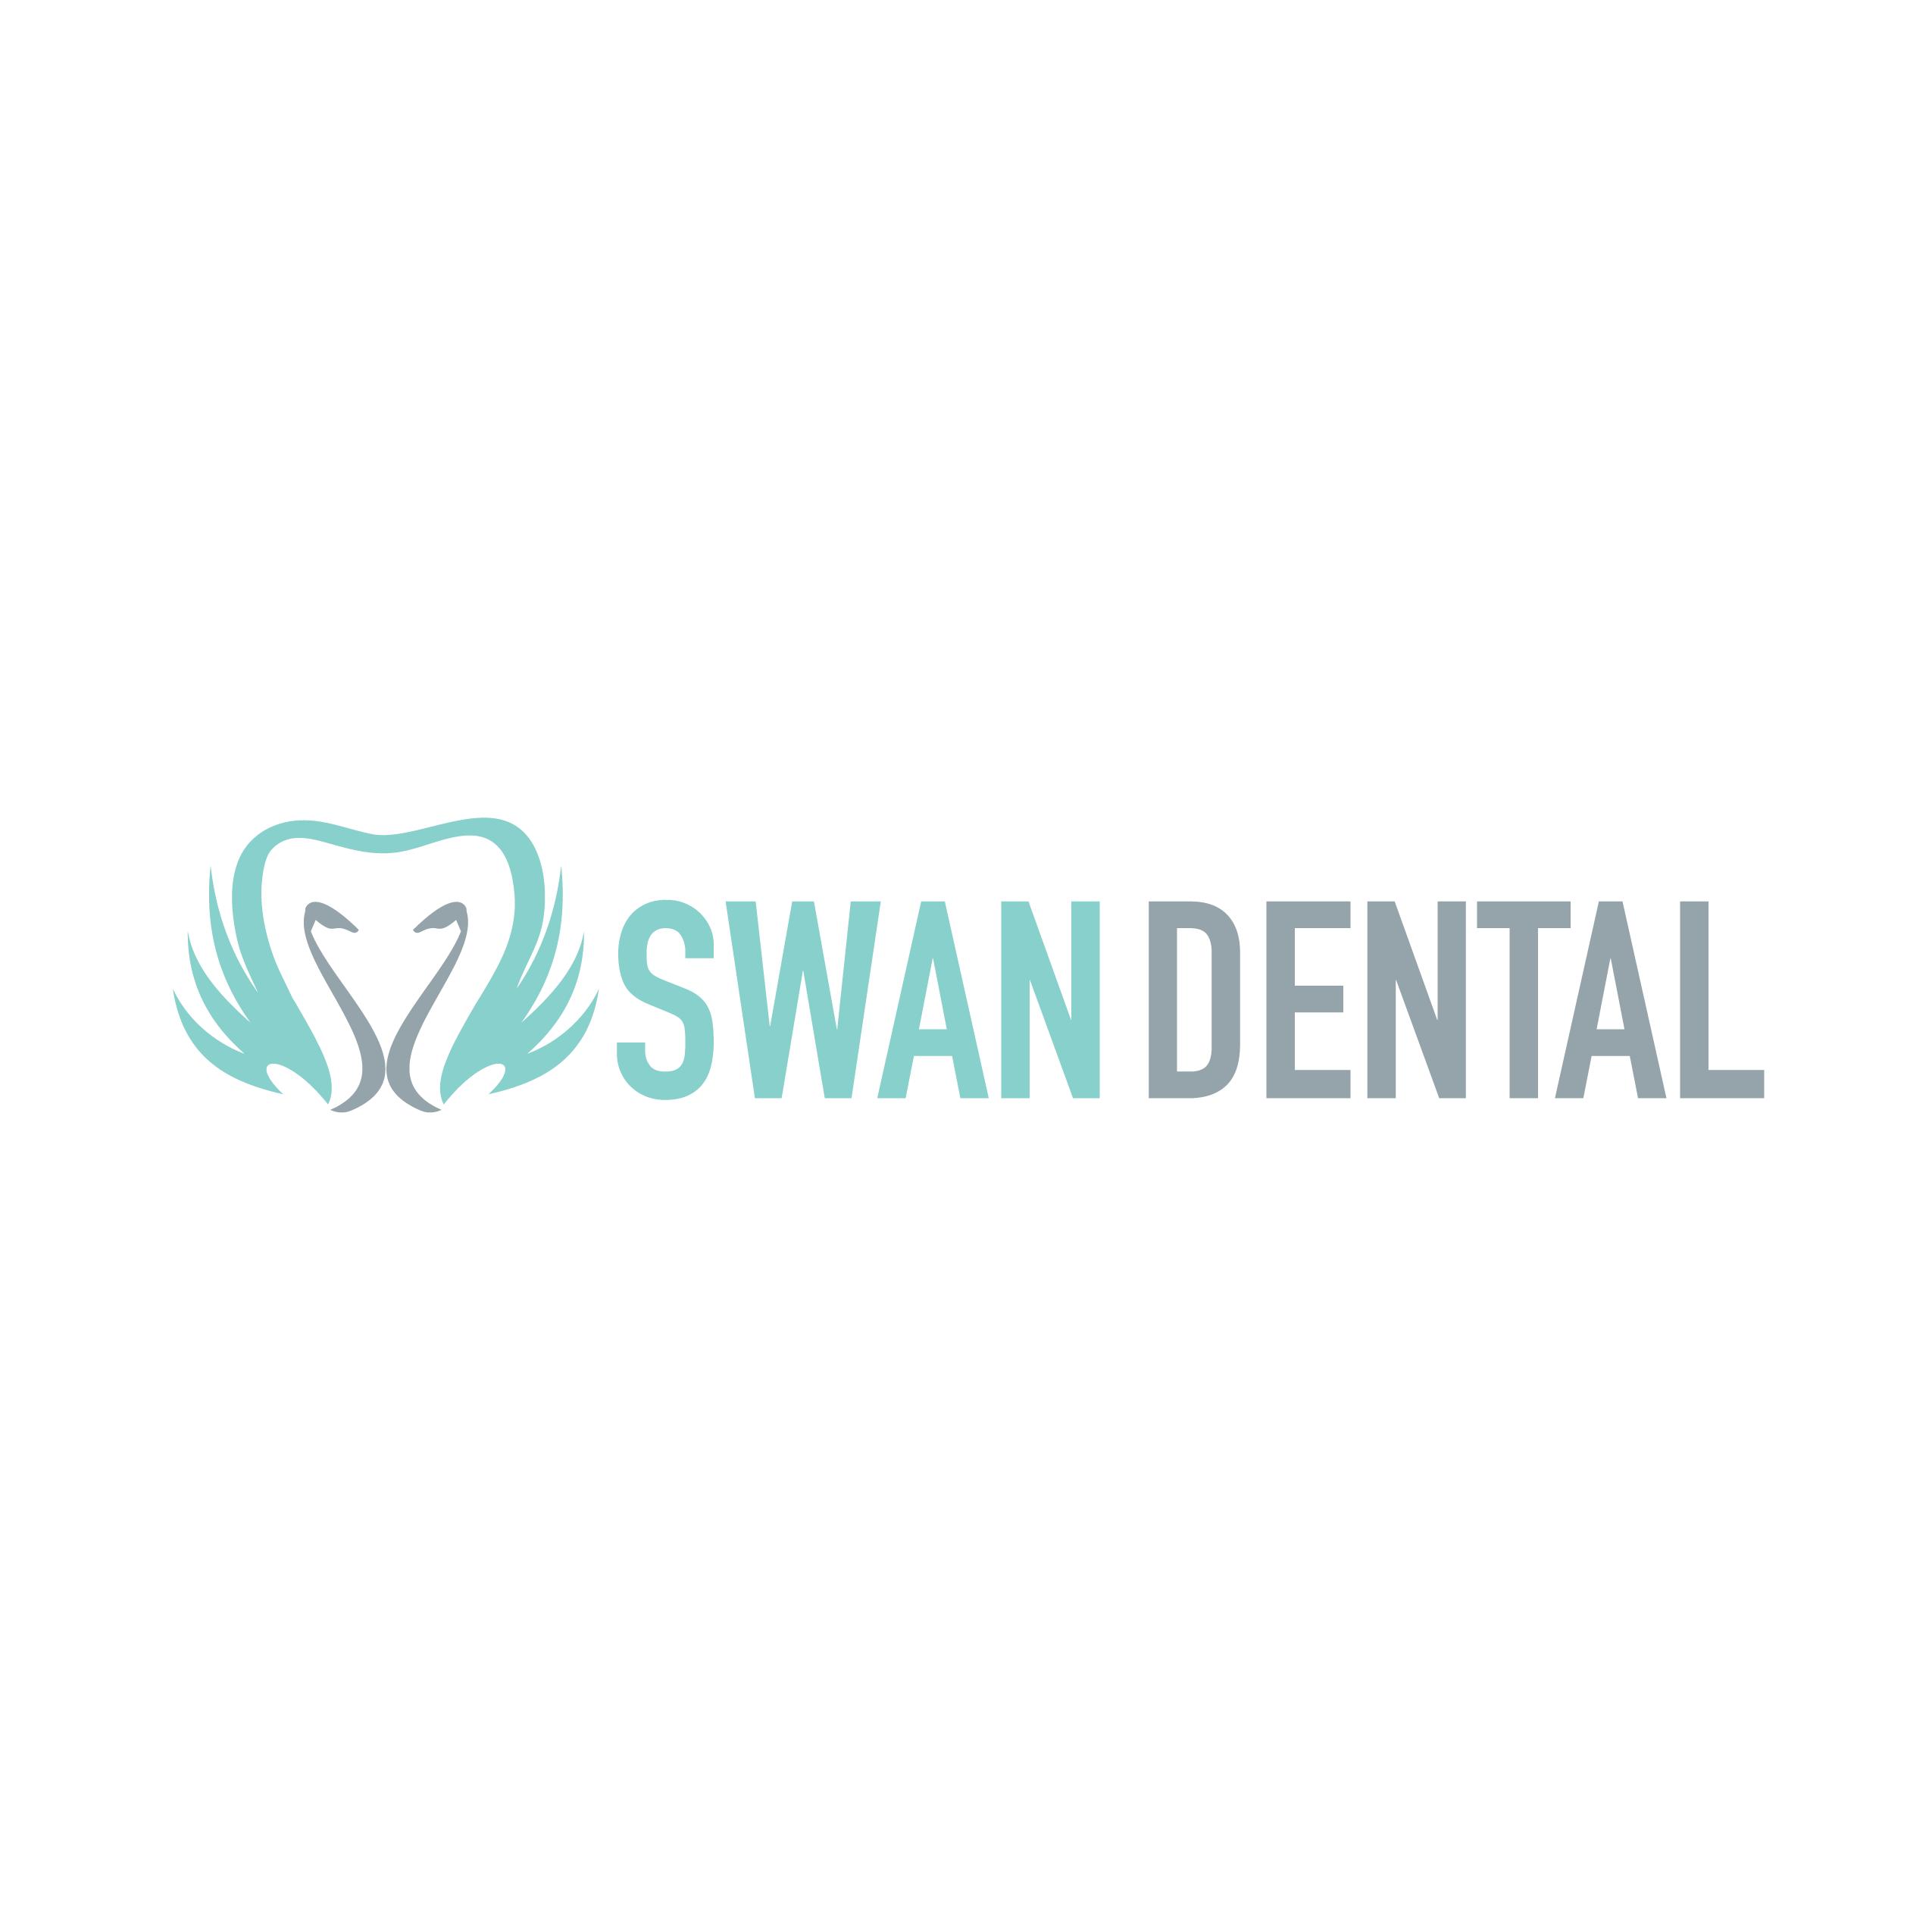 Swan Dental